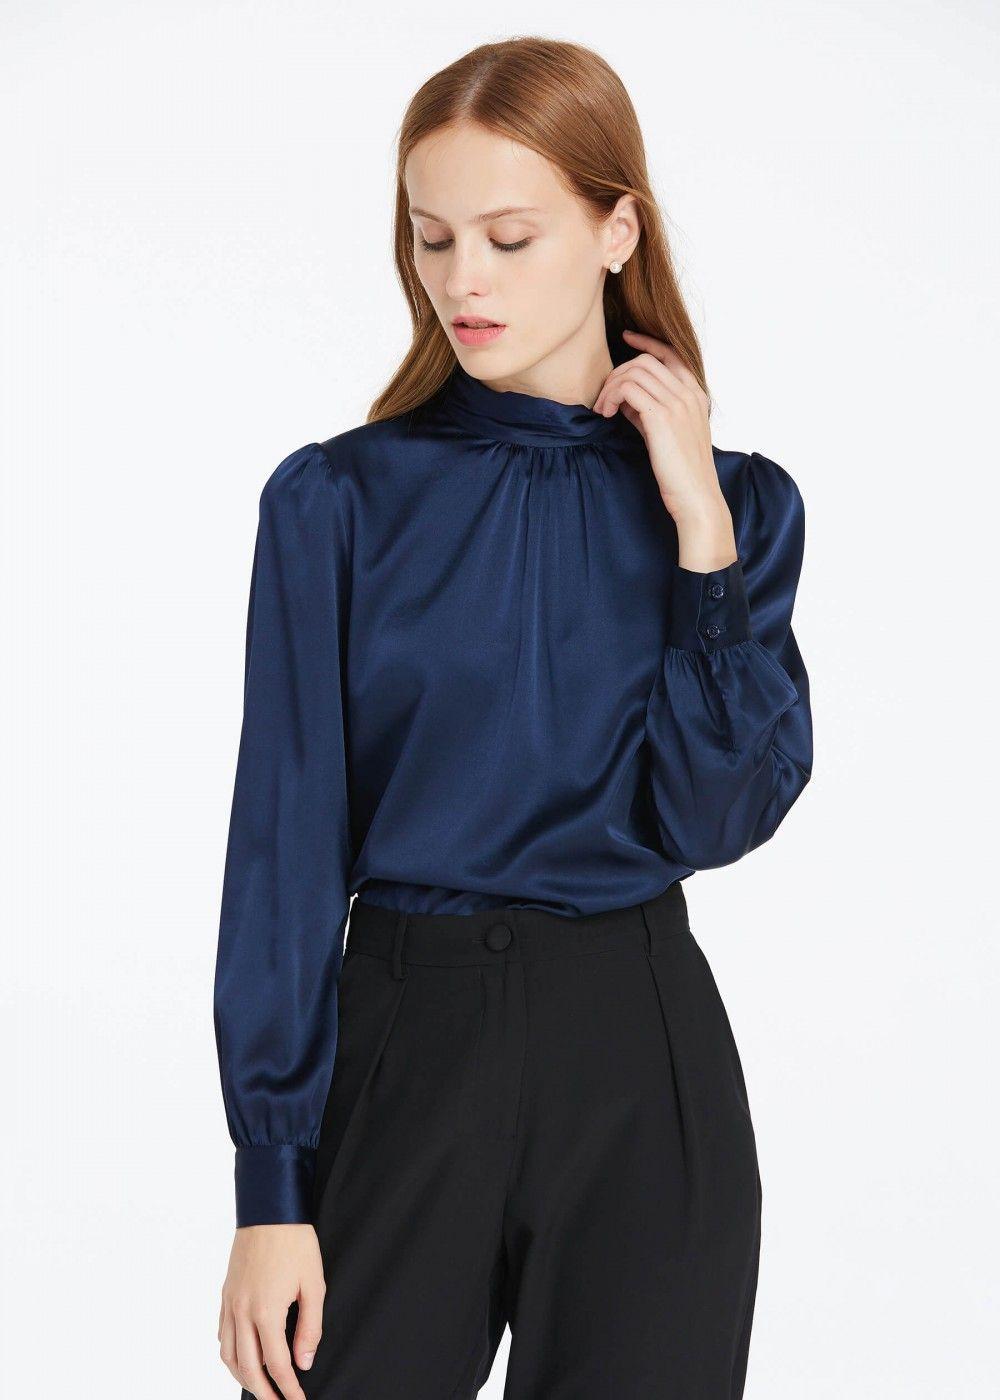 3c66617630d36 retro style silk blouse